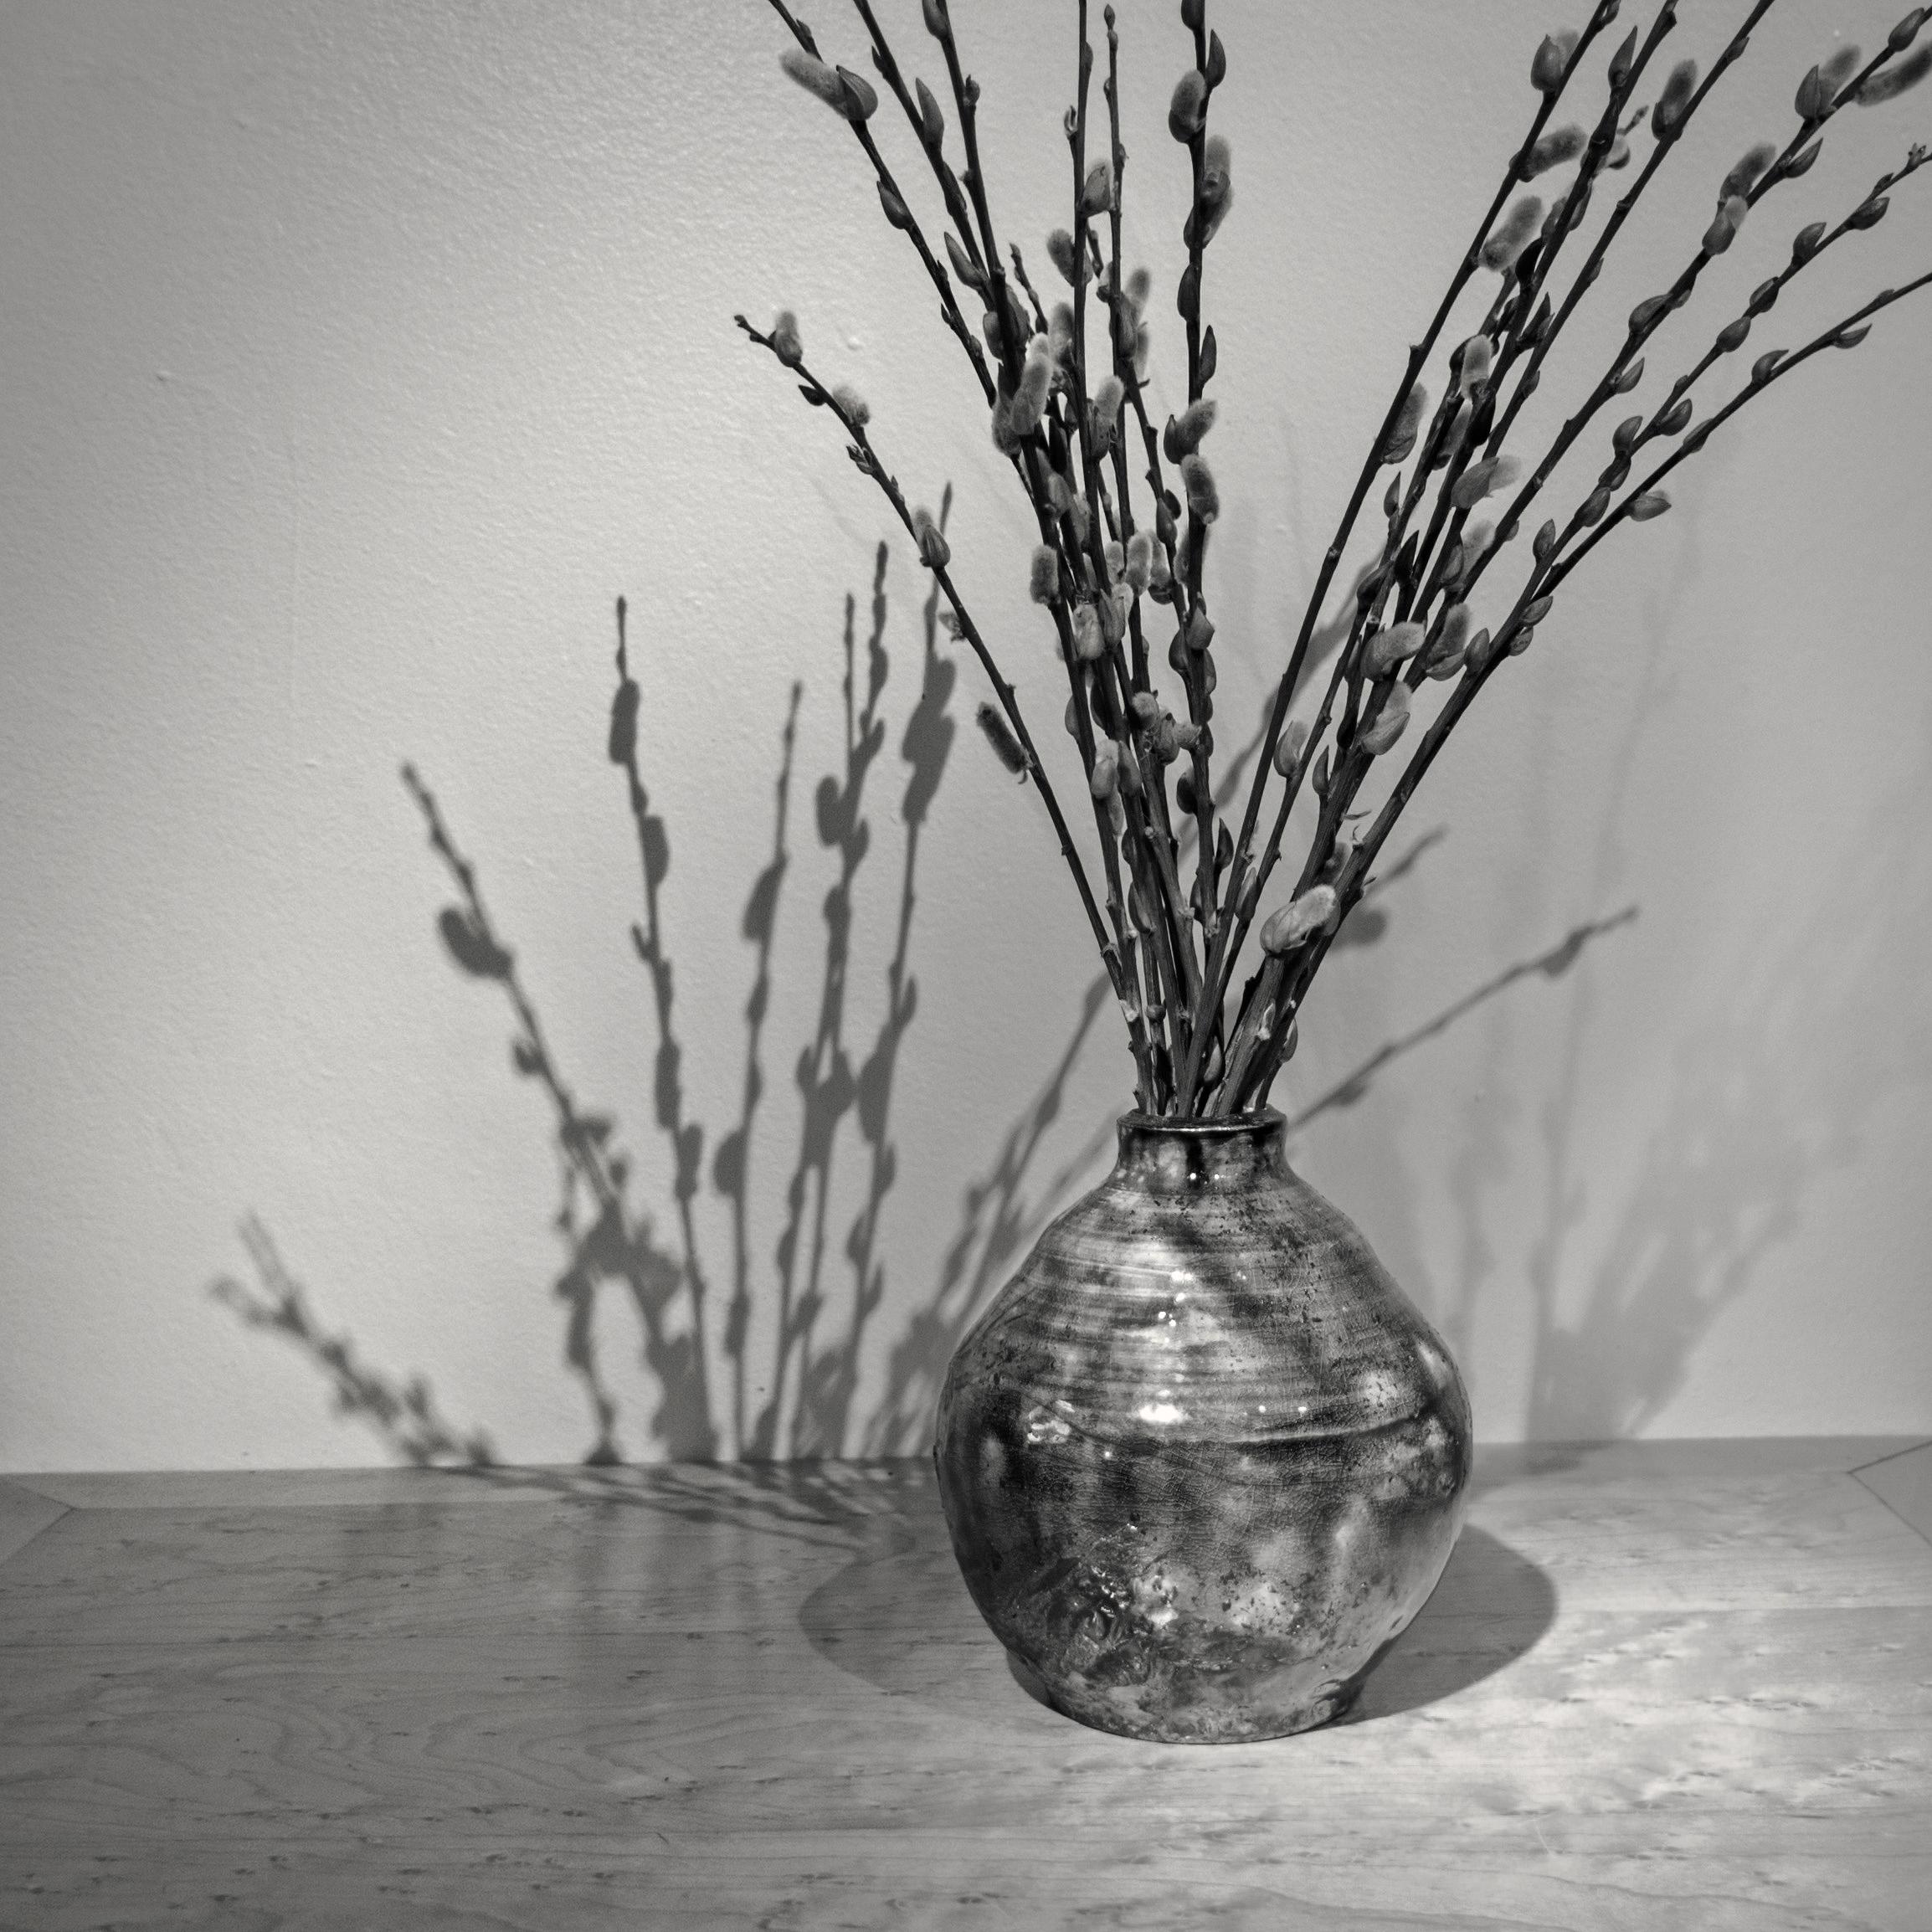 71+ Gambar Hitam Putih Vas HD